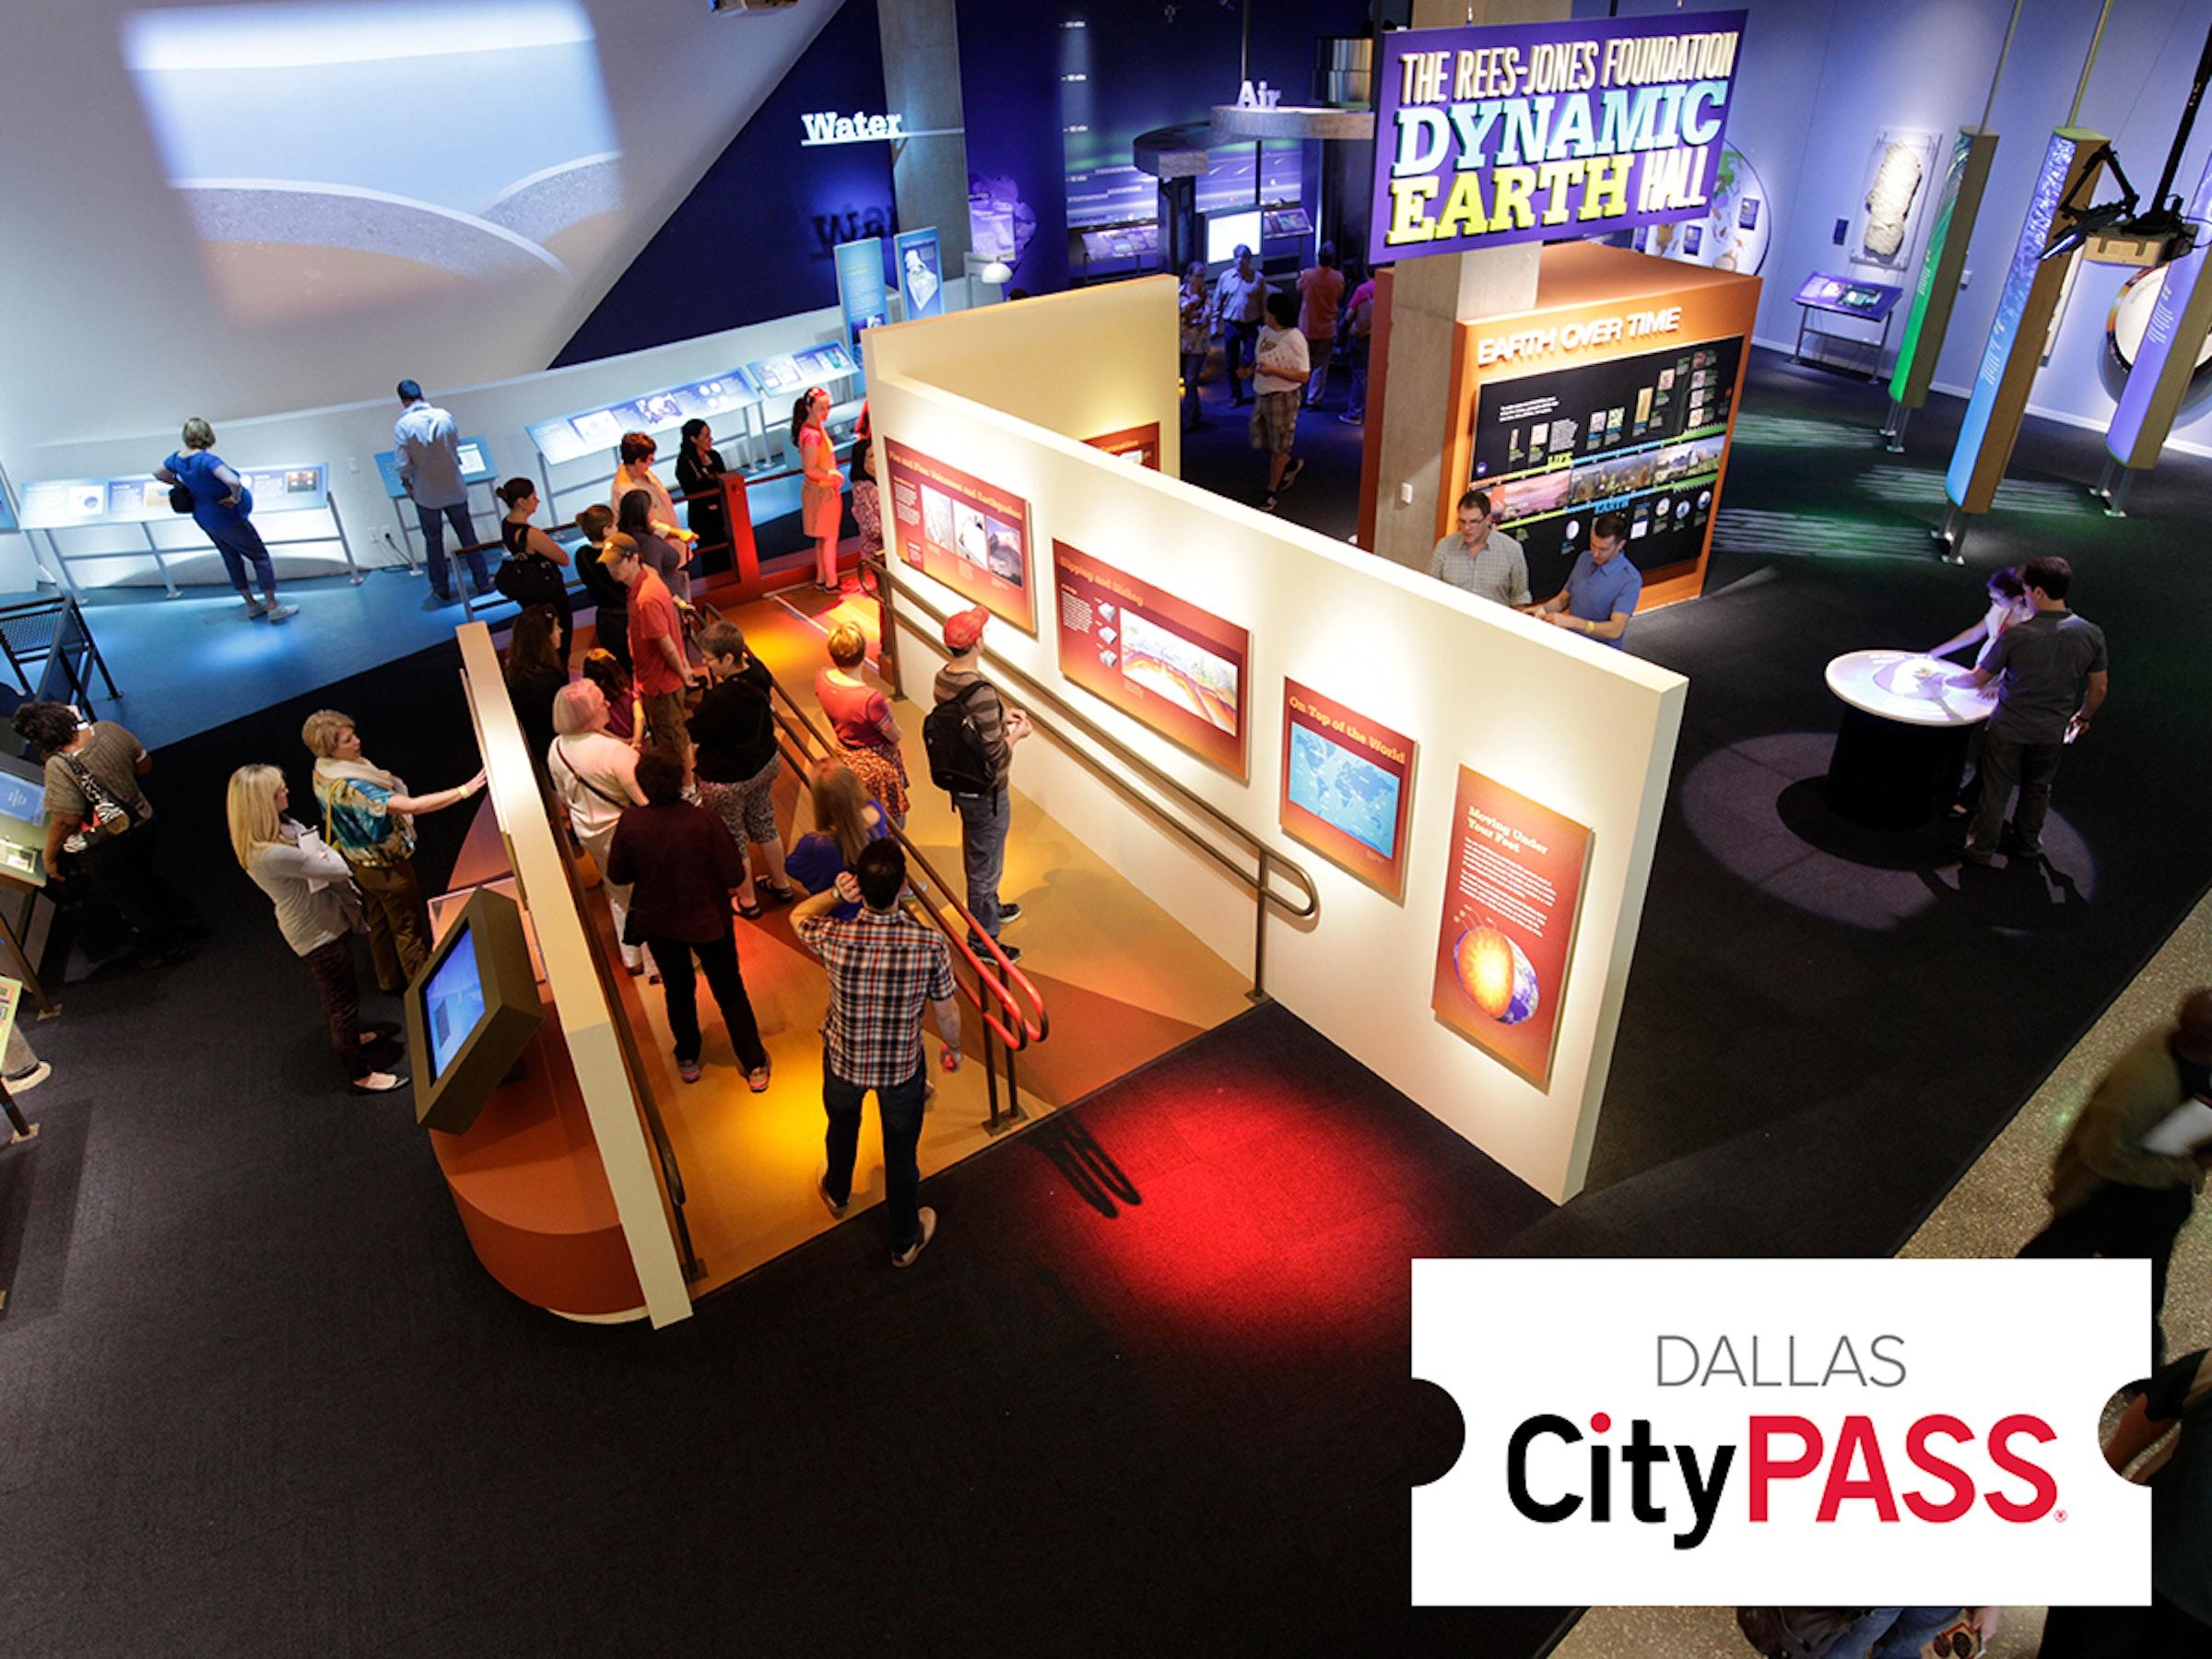 Dallas CityPASS in Beyond Dallas